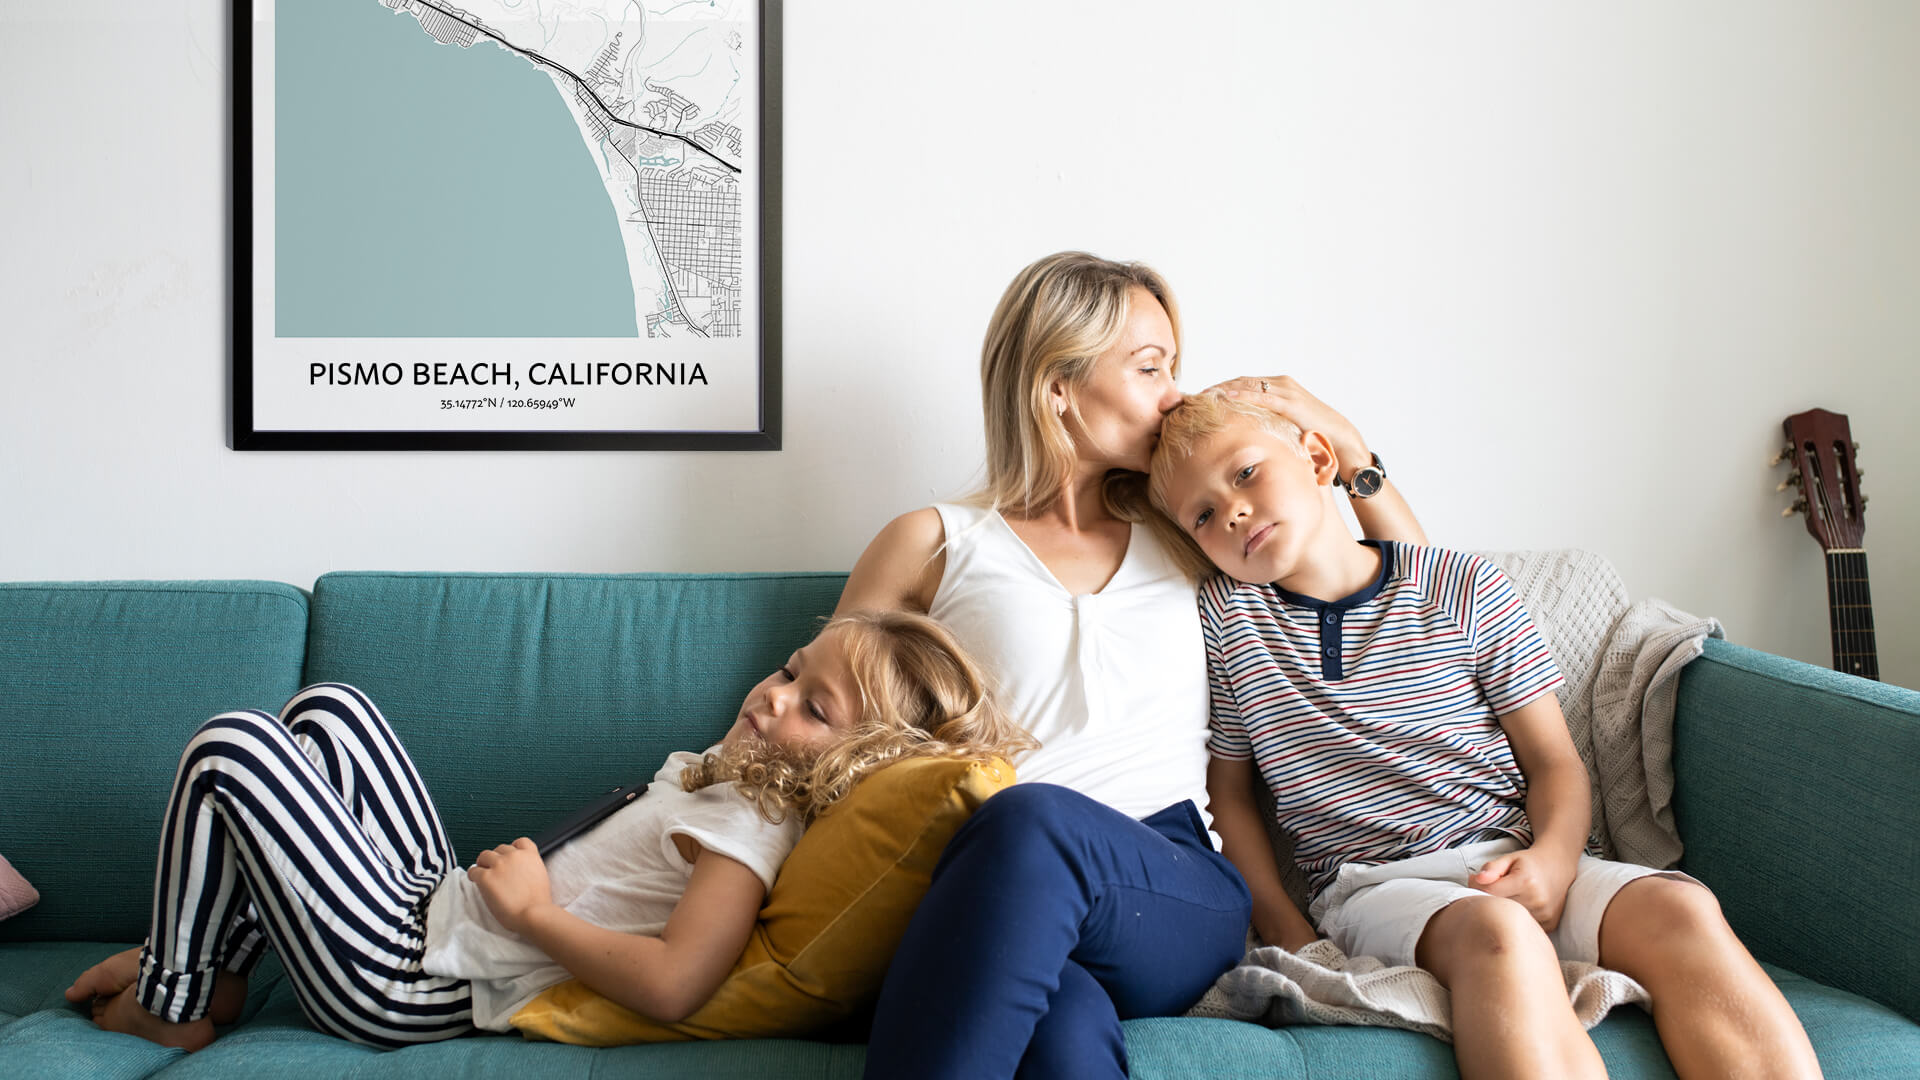 Pismo Beach map poster